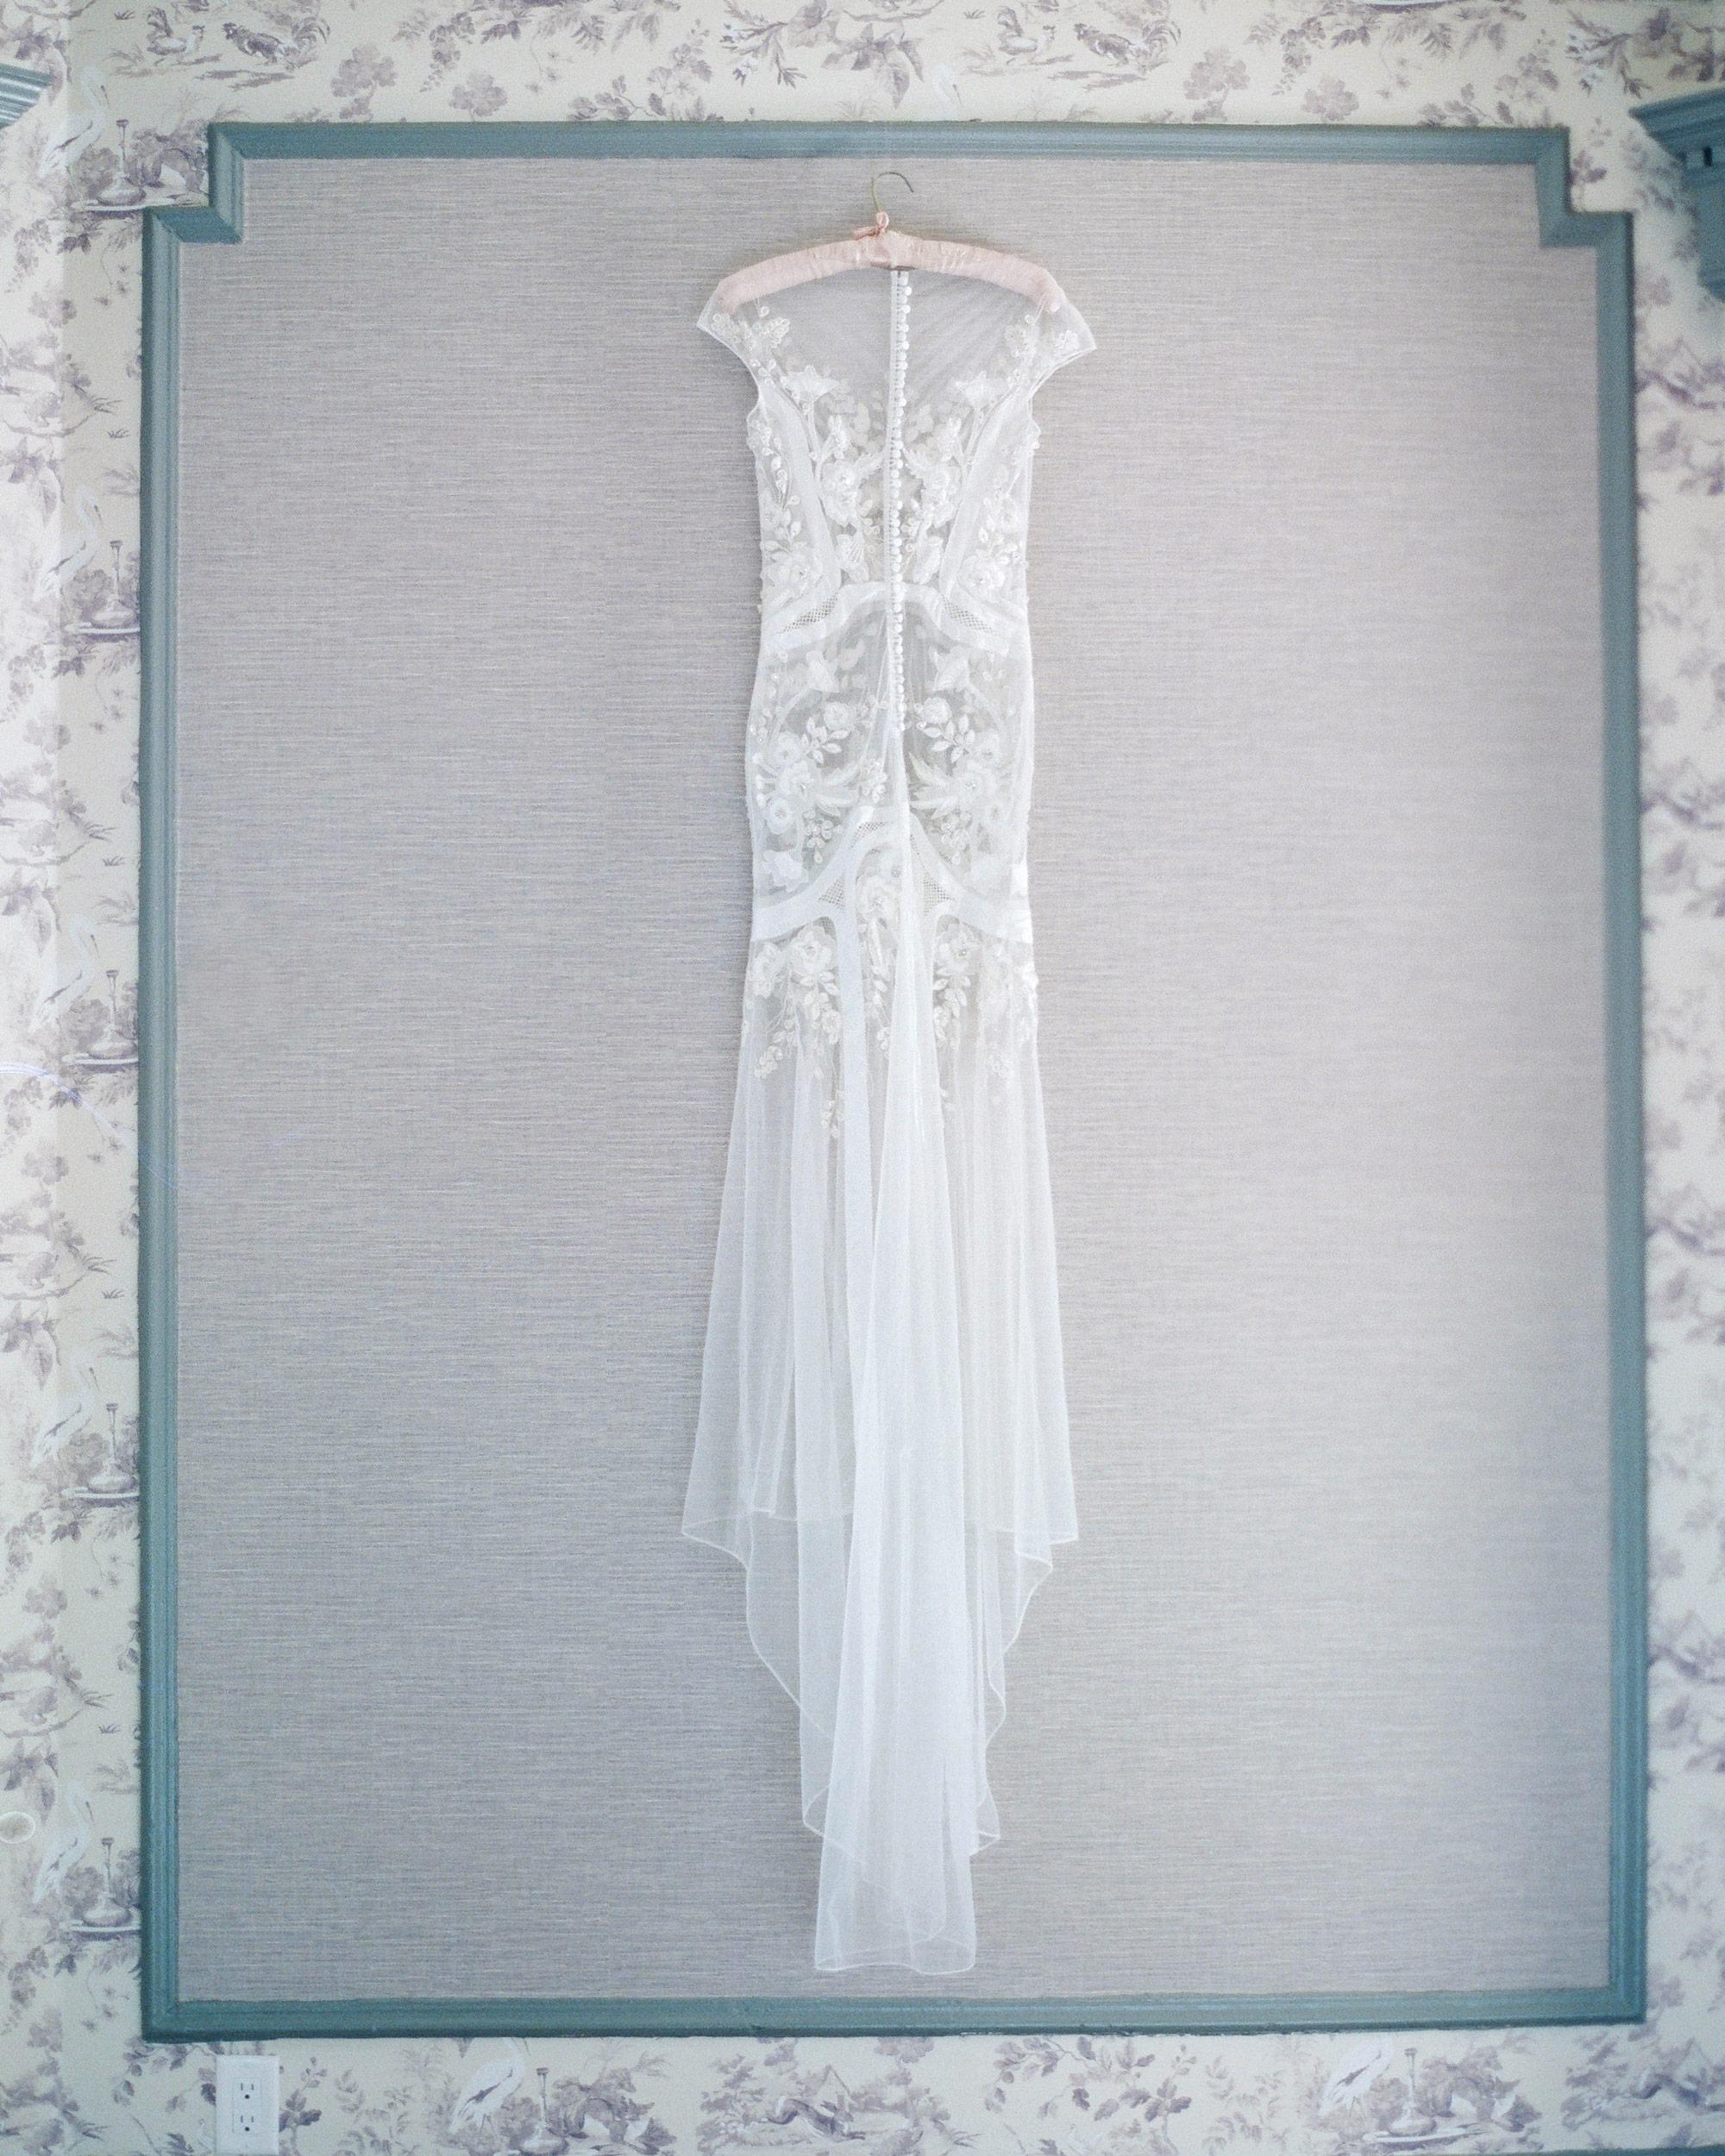 adrienne-jason-wedding-minnesota-dress-0245-s111925.jpg